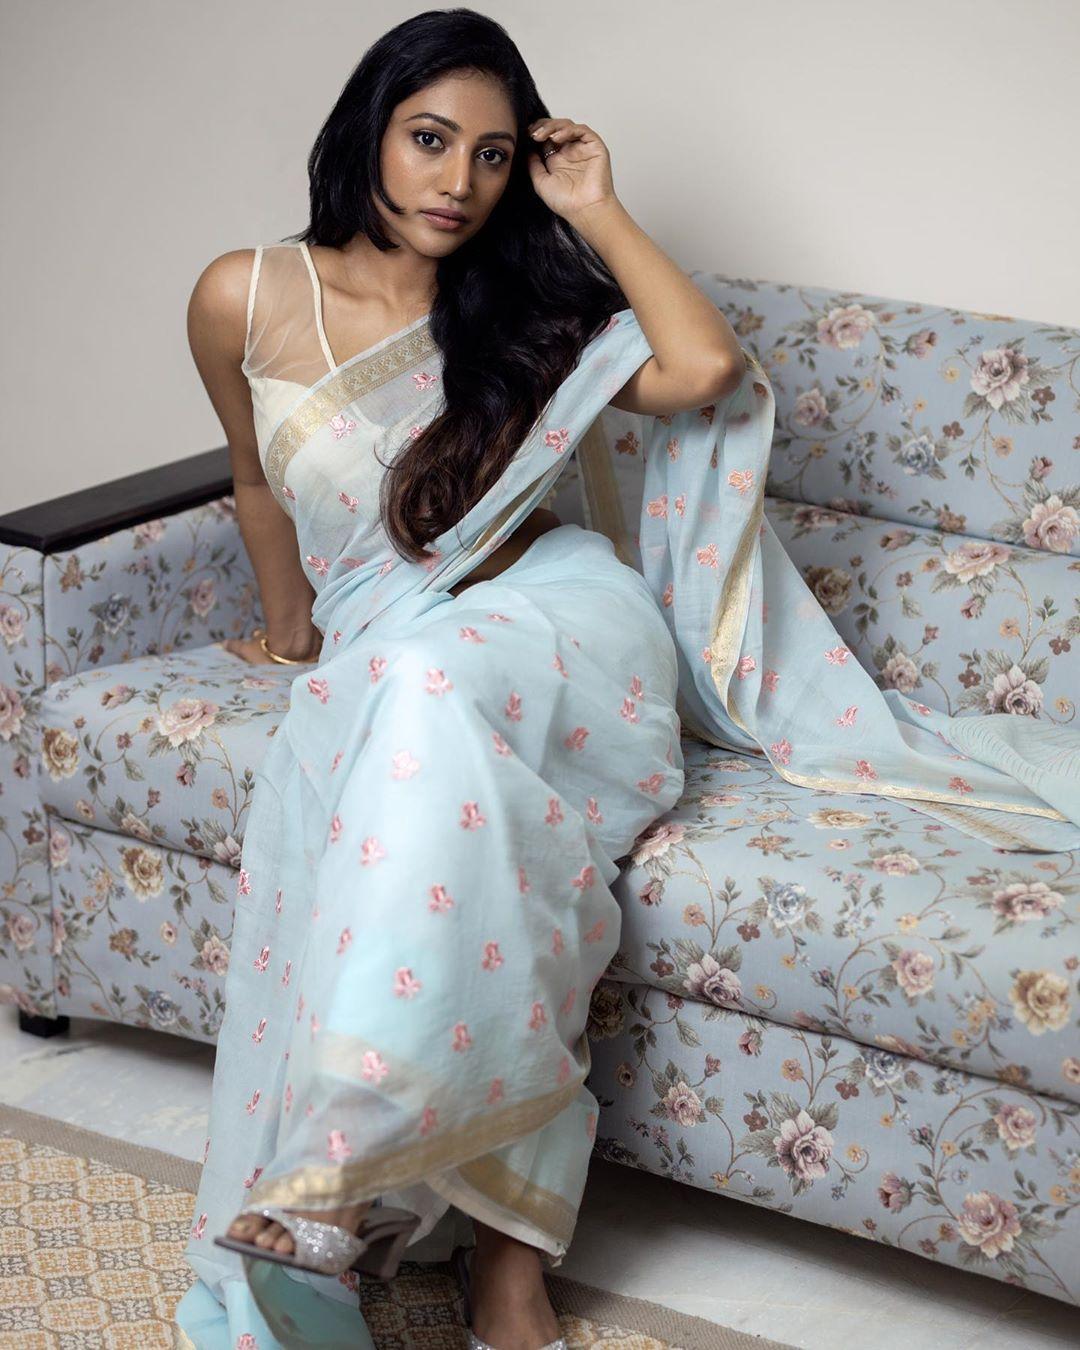 Bommu Lakshmi photos (51)